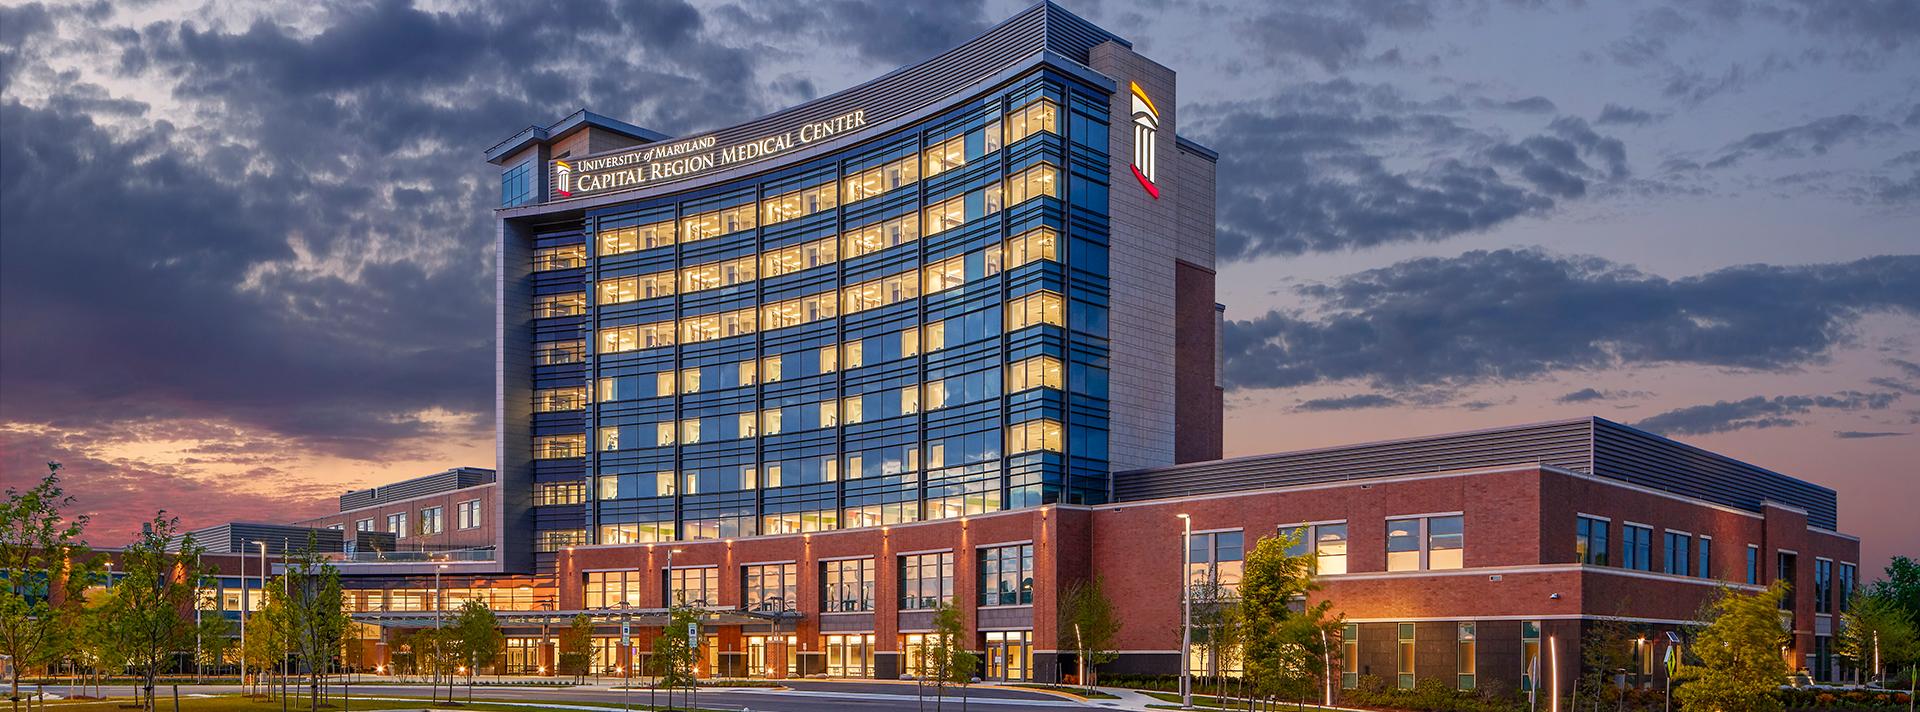 University of Maryland Capital Region Medical Center